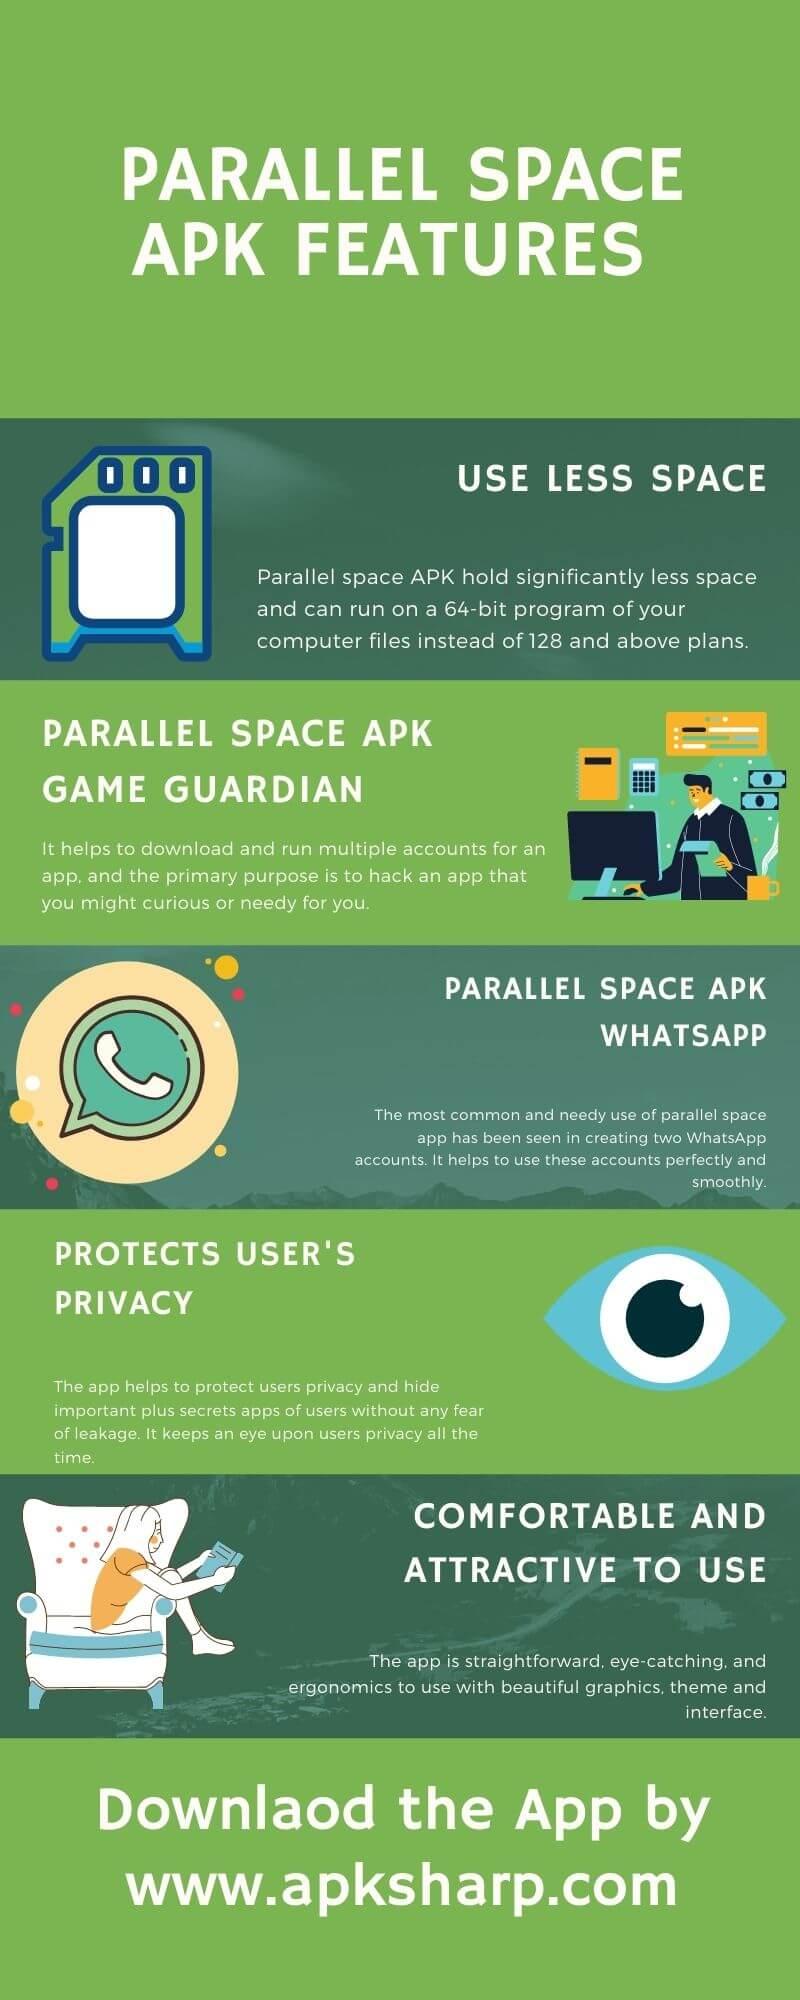 Parallel Space APK Features